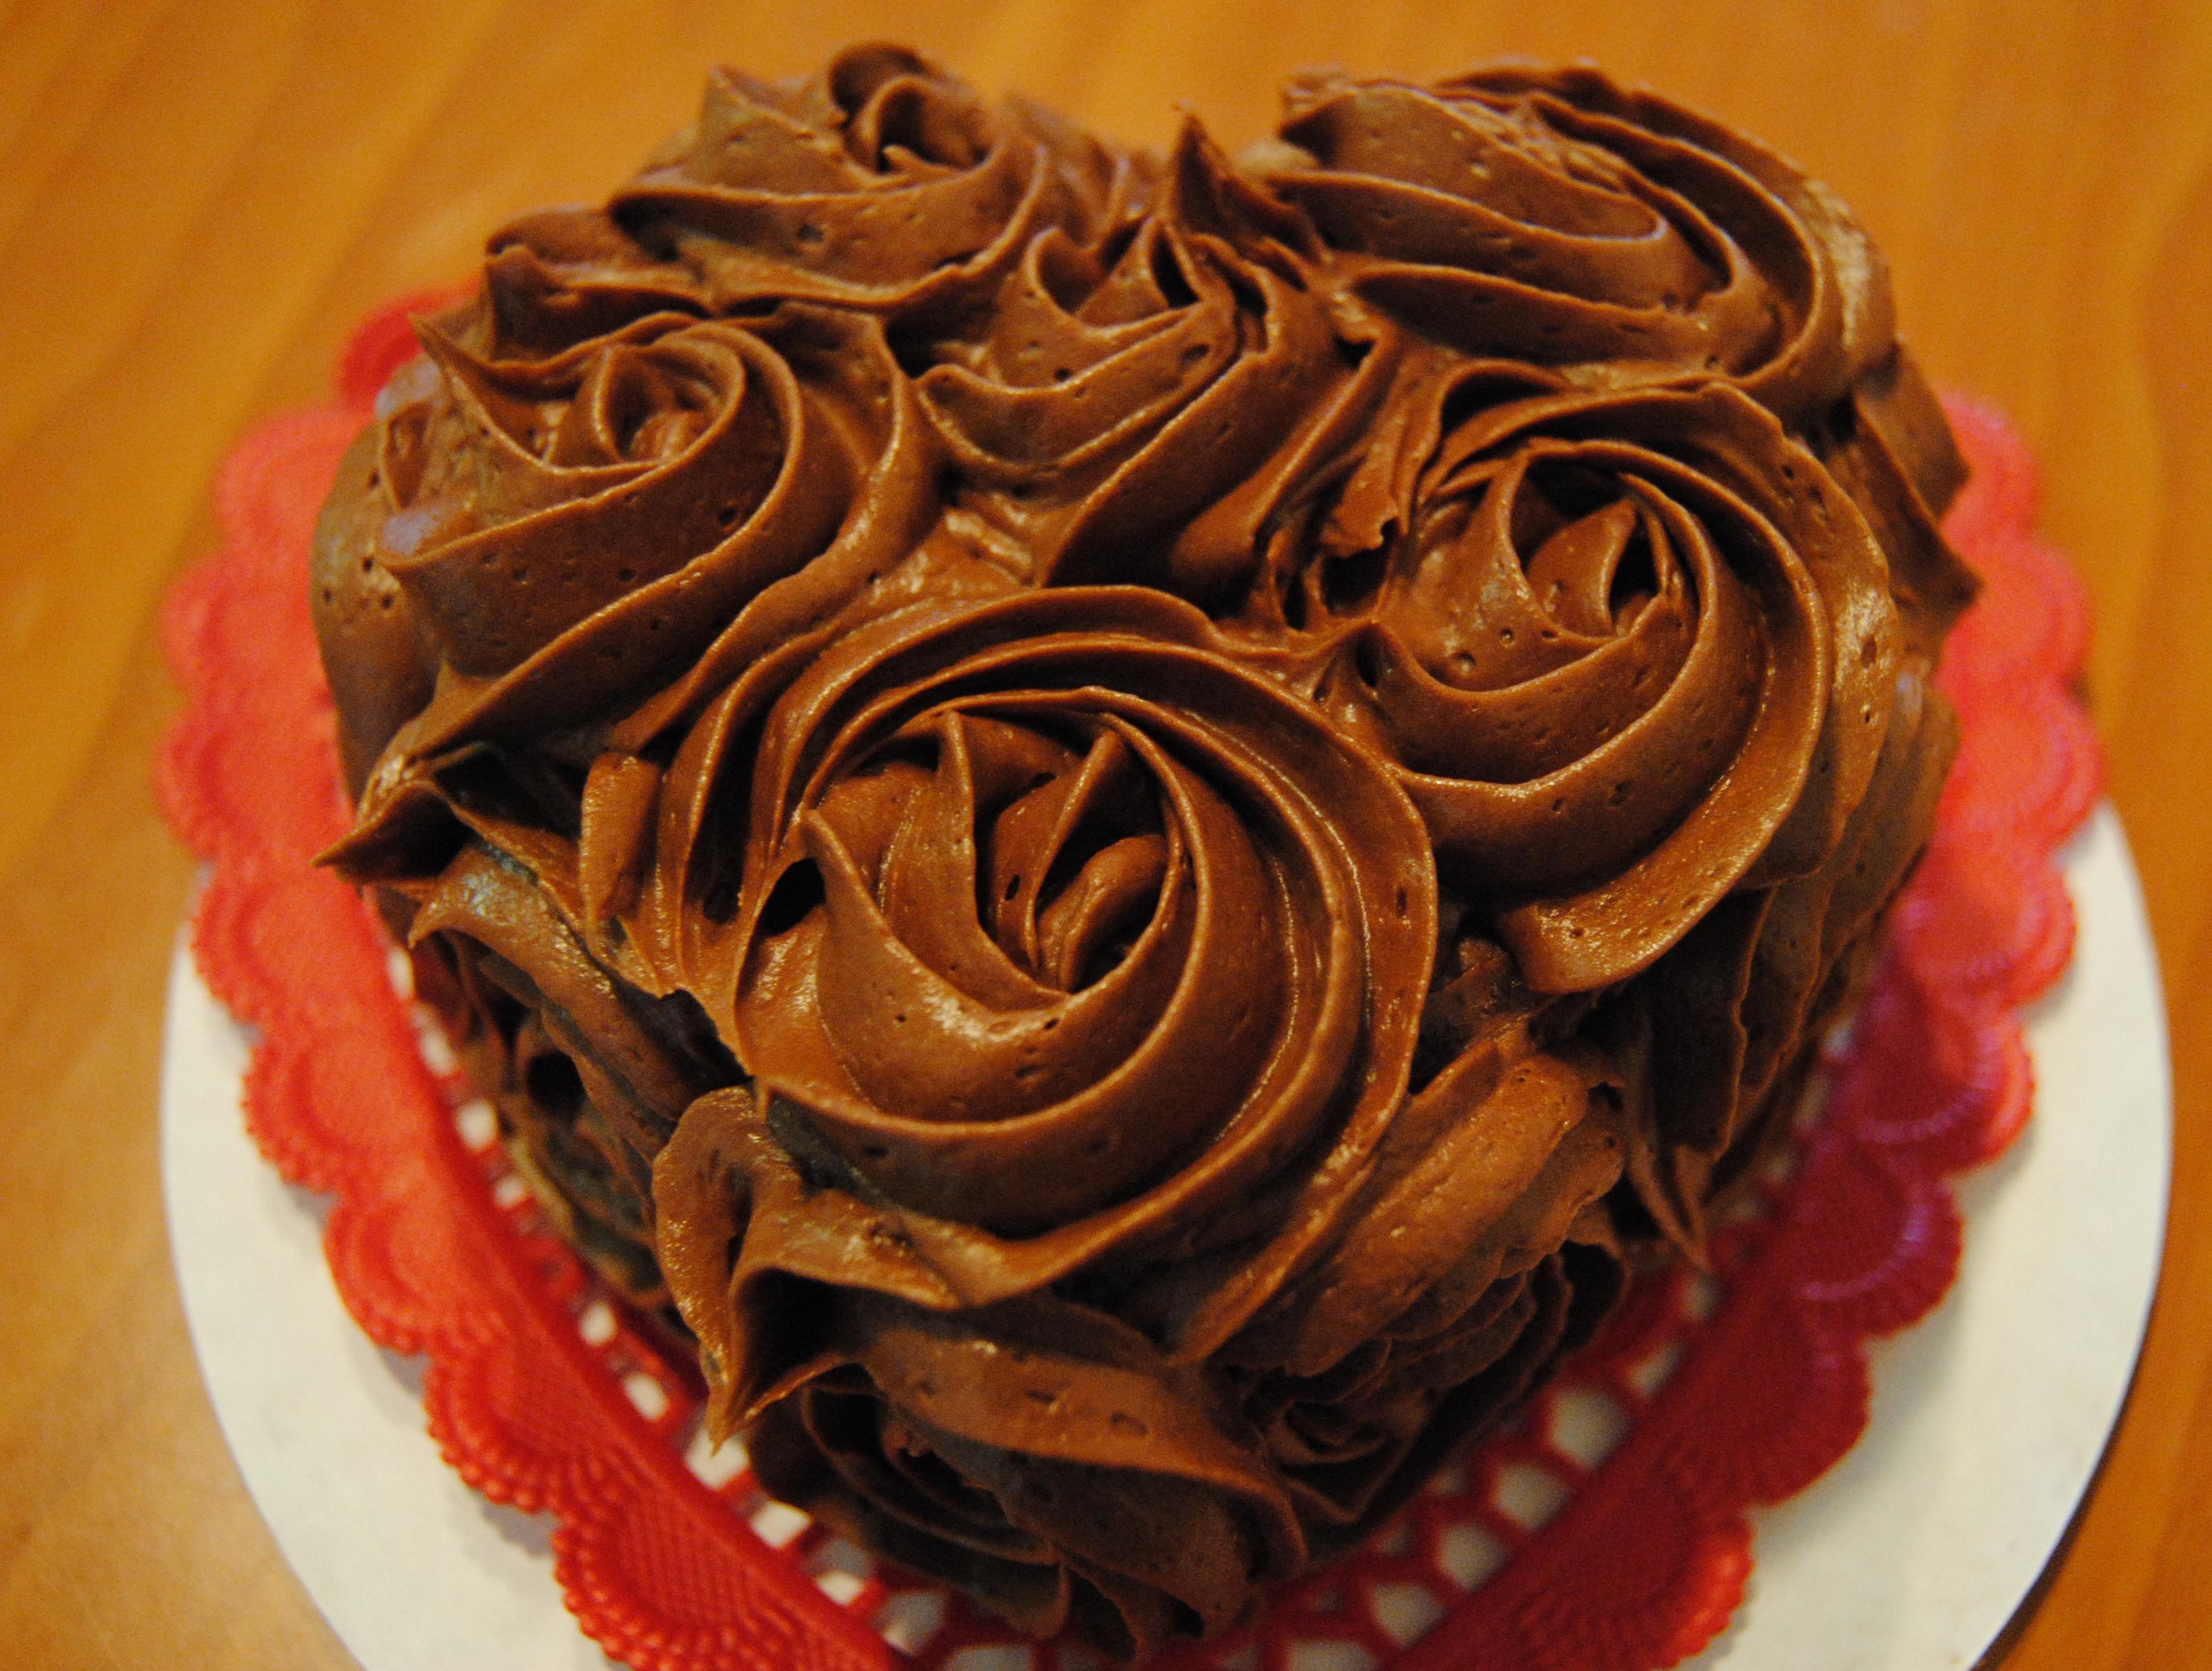 Cake Decorations Chocolate Hearts : I (Heart) You Cake Coffee. Cupcakes. Wine